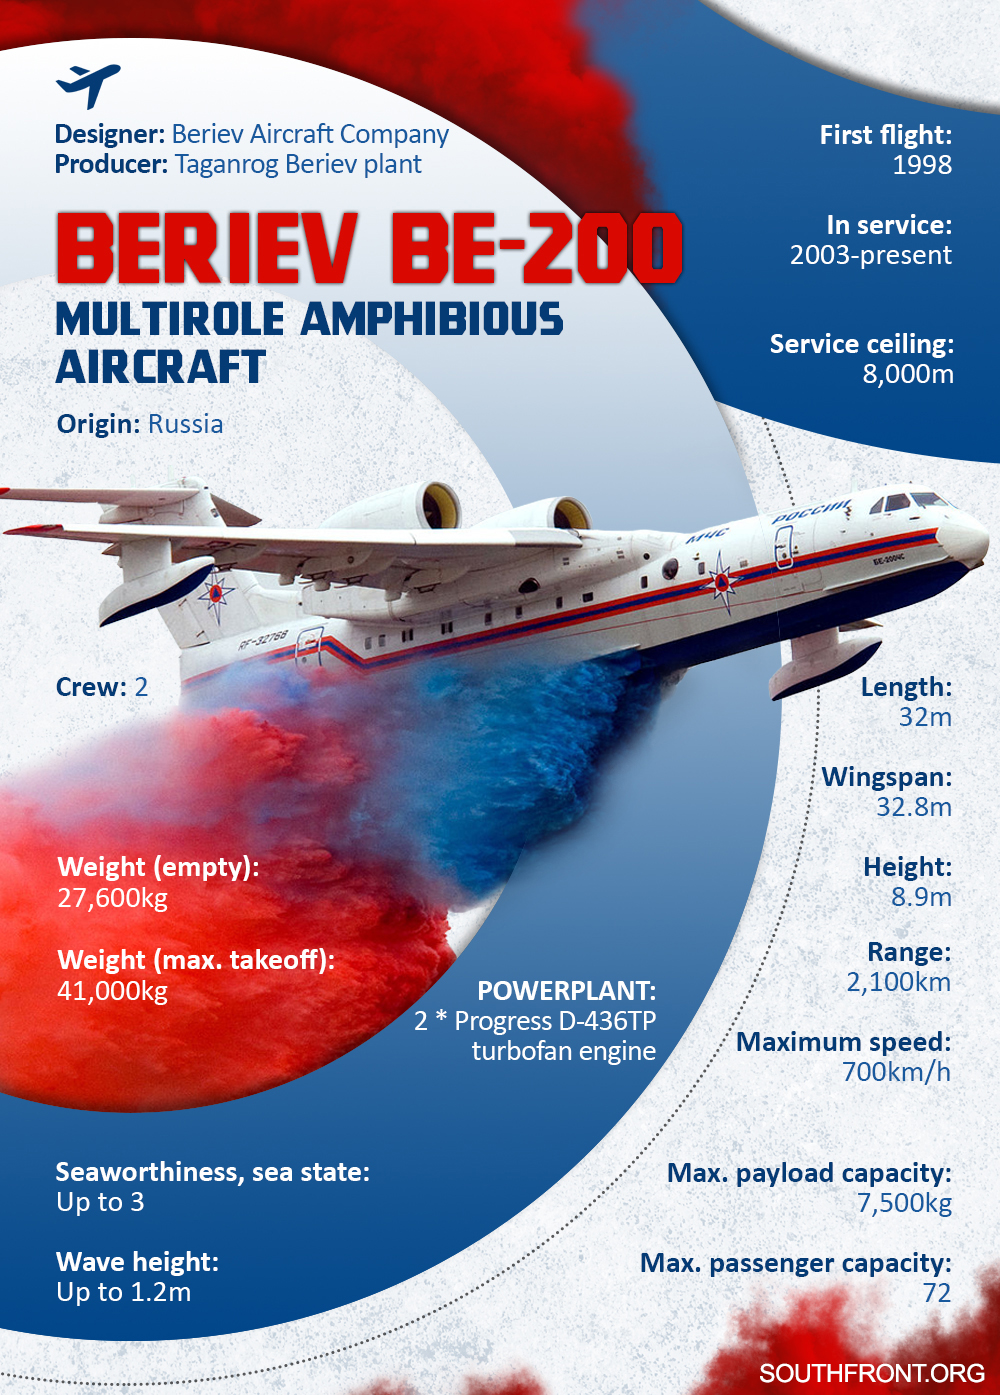 Beriev Be-200 Multirole Amphibious Aircraft (Infographics)